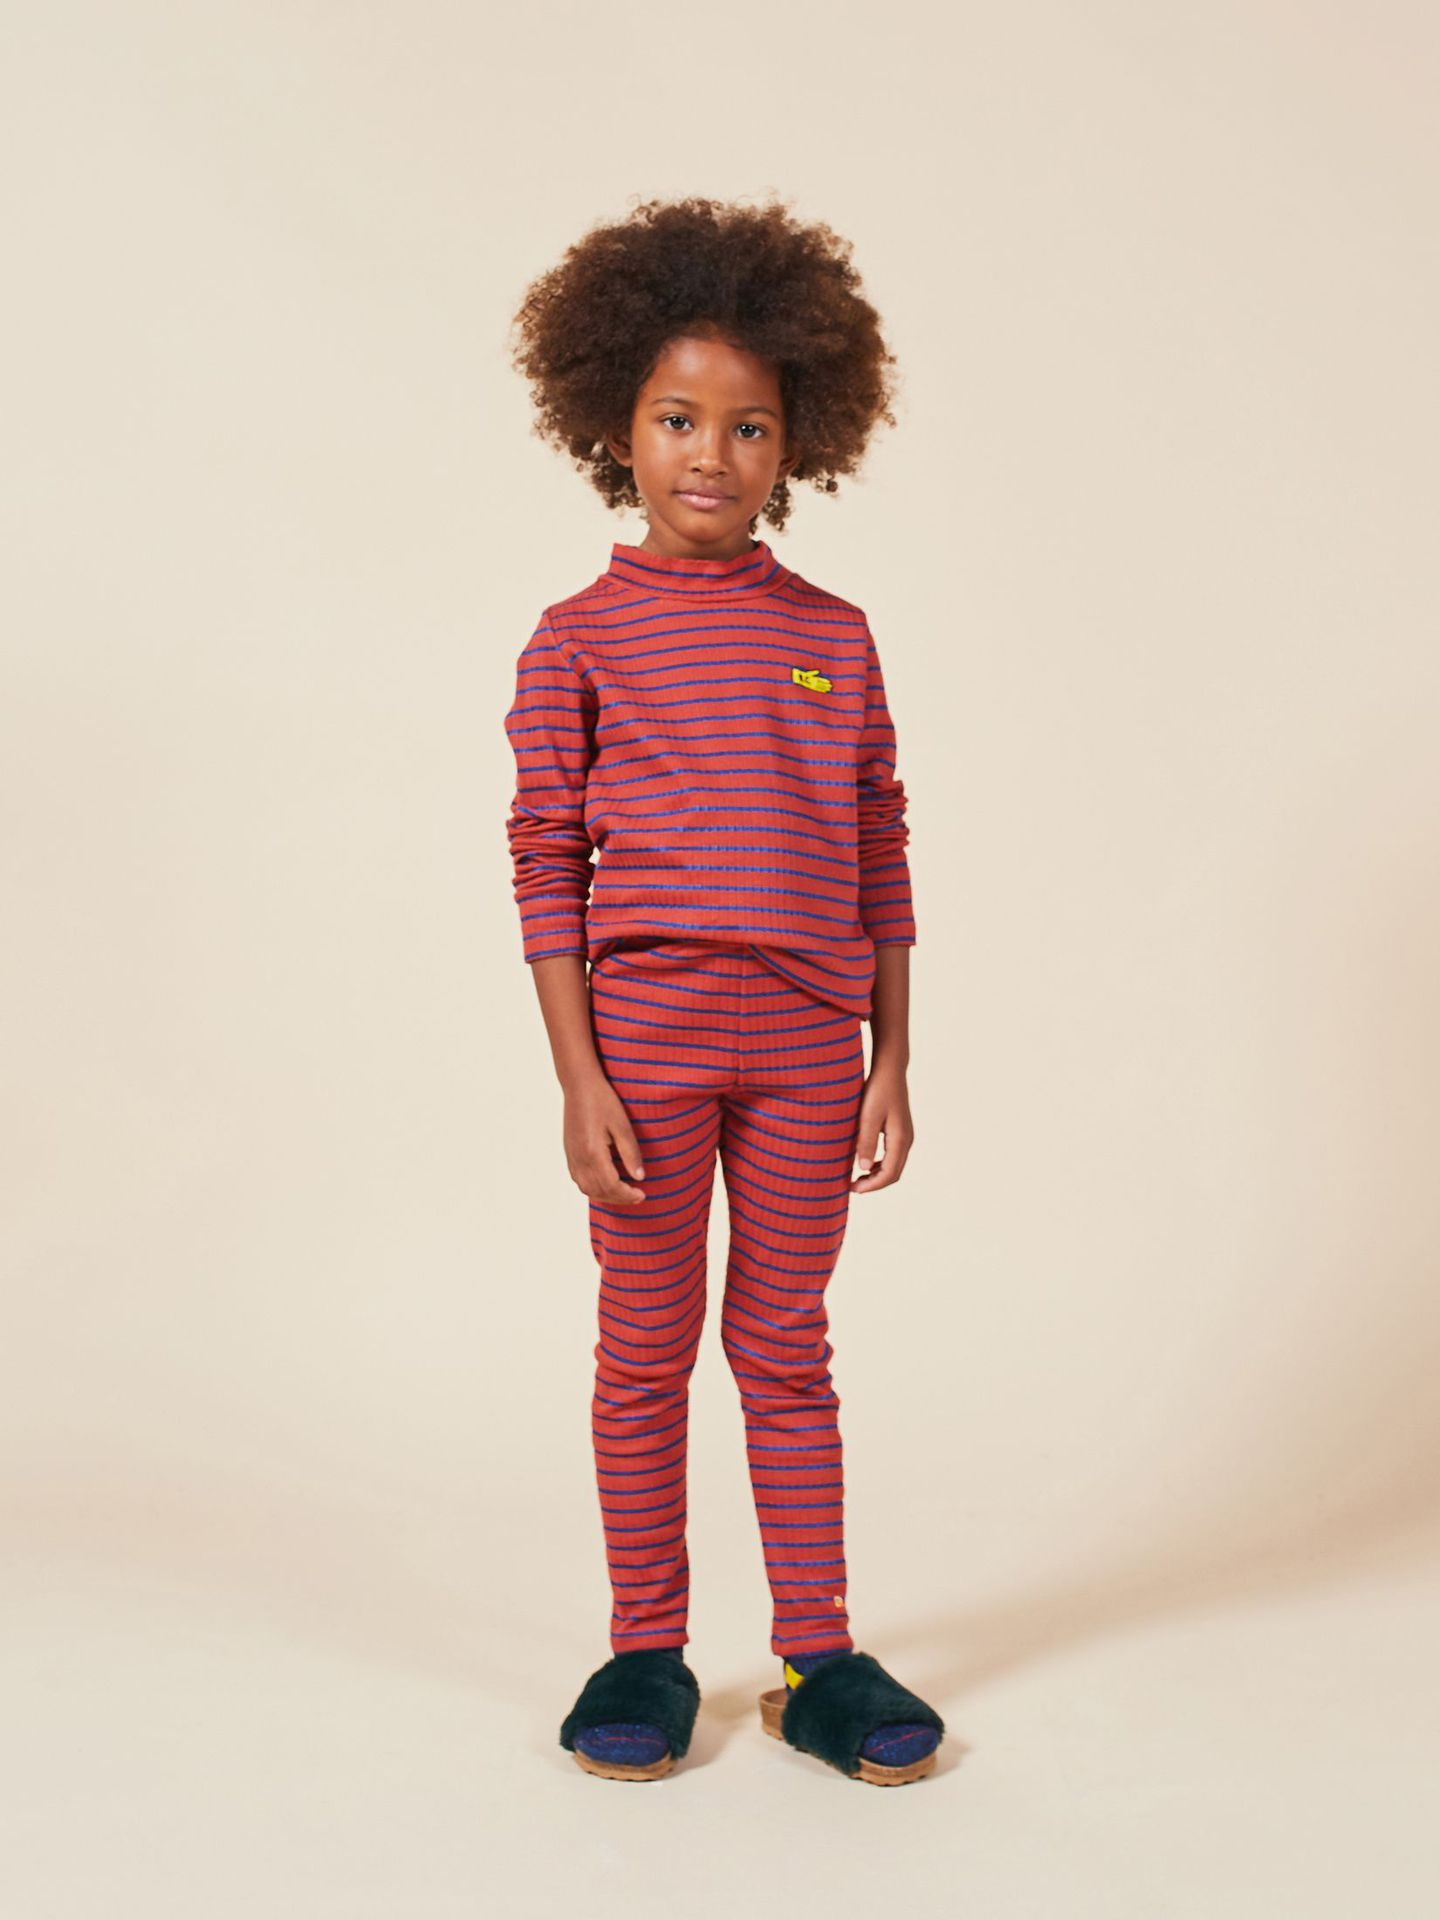 2020 Autumn Winter Girls Clothing Sets Pajama Sets Kids Clothes Vestidos  Long Sleeved T shirts+ Leggings Christmas Clothing 4